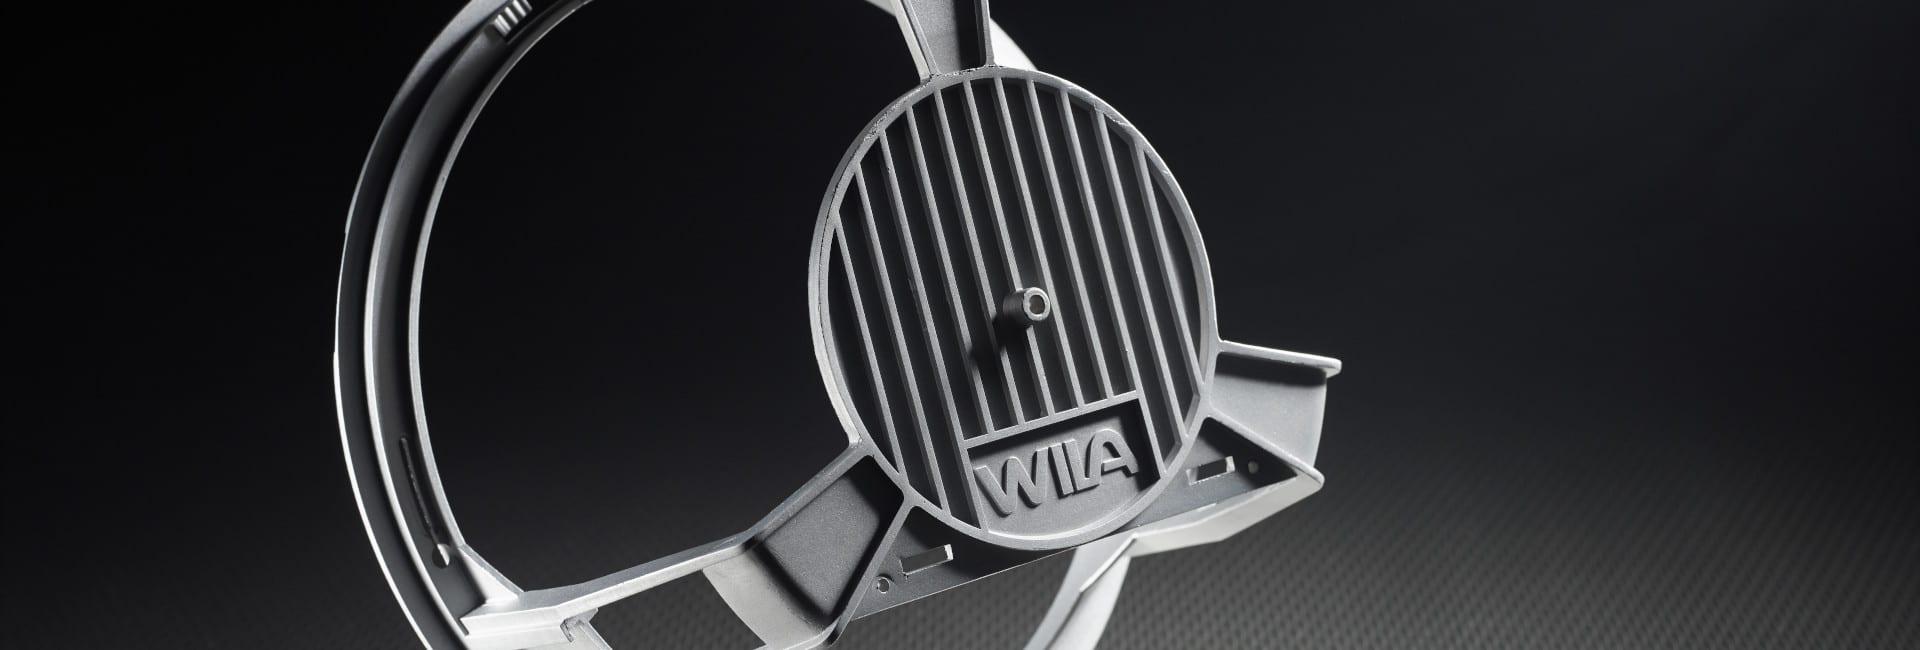 Metallguss Kleinserie